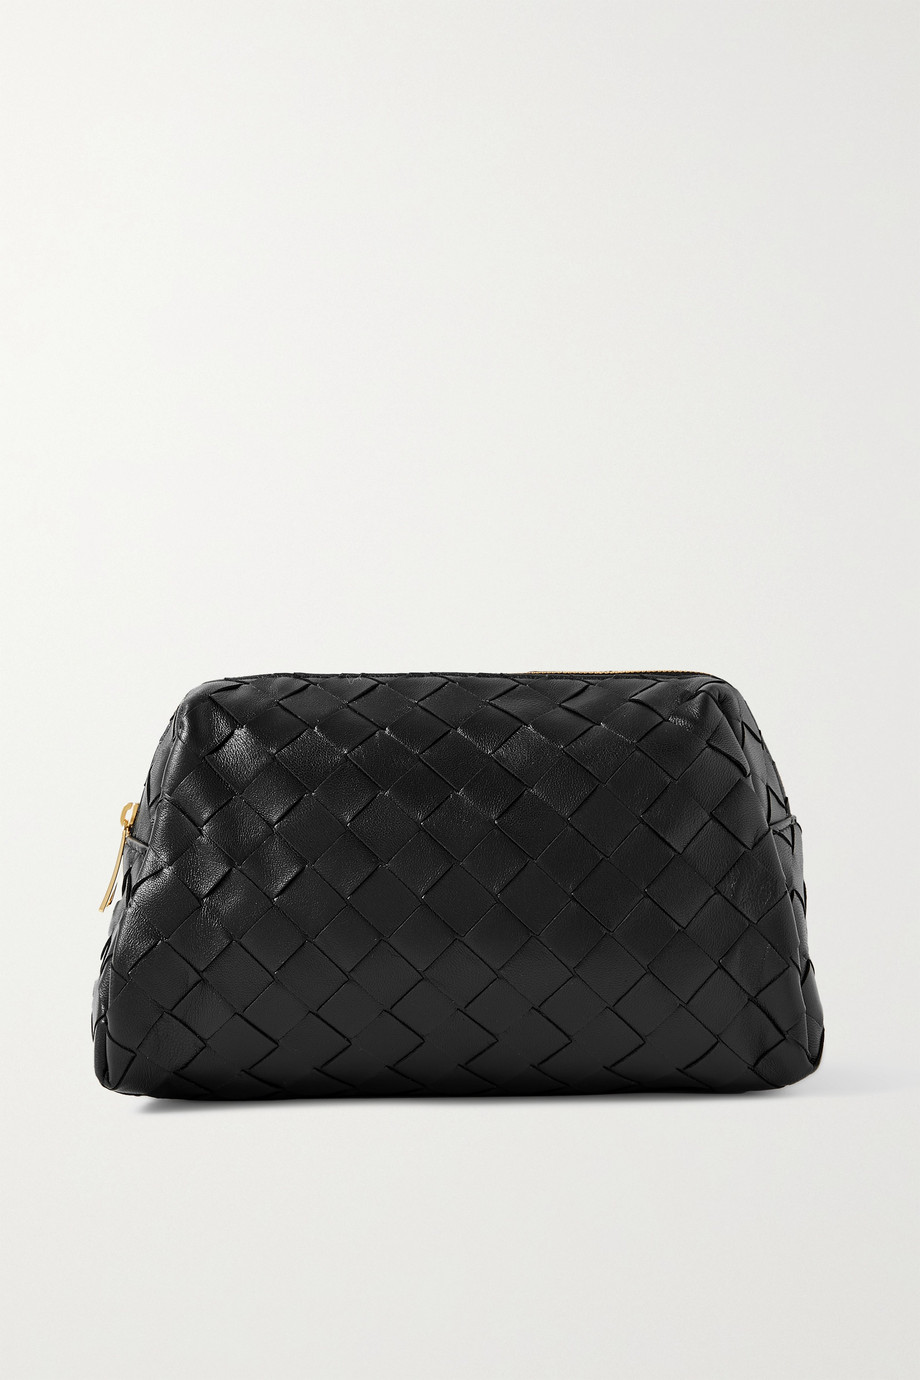 Bottega Veneta Mittelgroße Kosmetiktasche aus Intrecciato-Leder